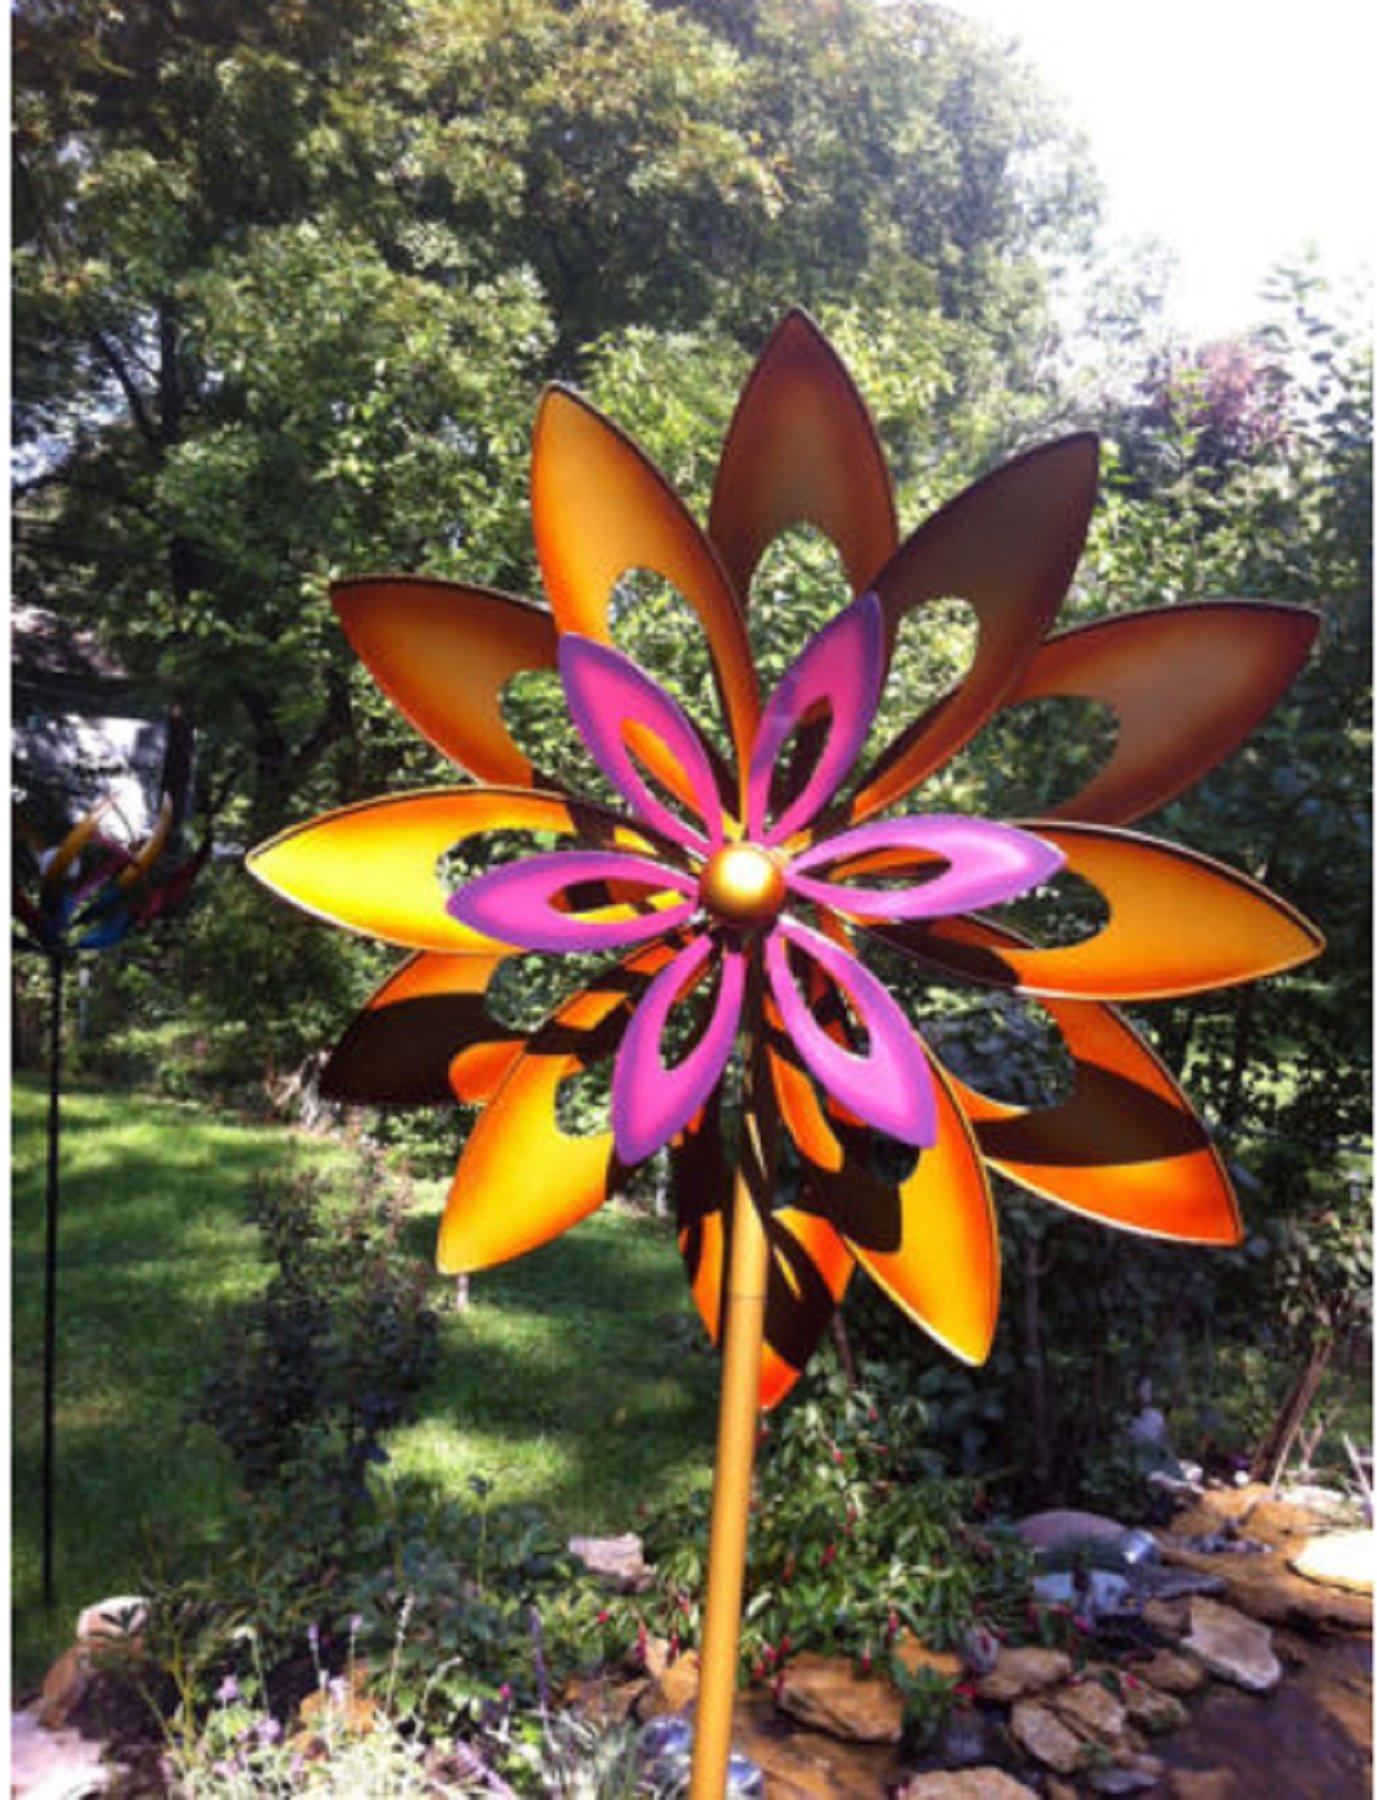 USA Premium Store large 2 ft Kinetic wind Sculpture Modern Art Dual spinner metal outdoor Pinwheel by USA Premium Store (Image #1)